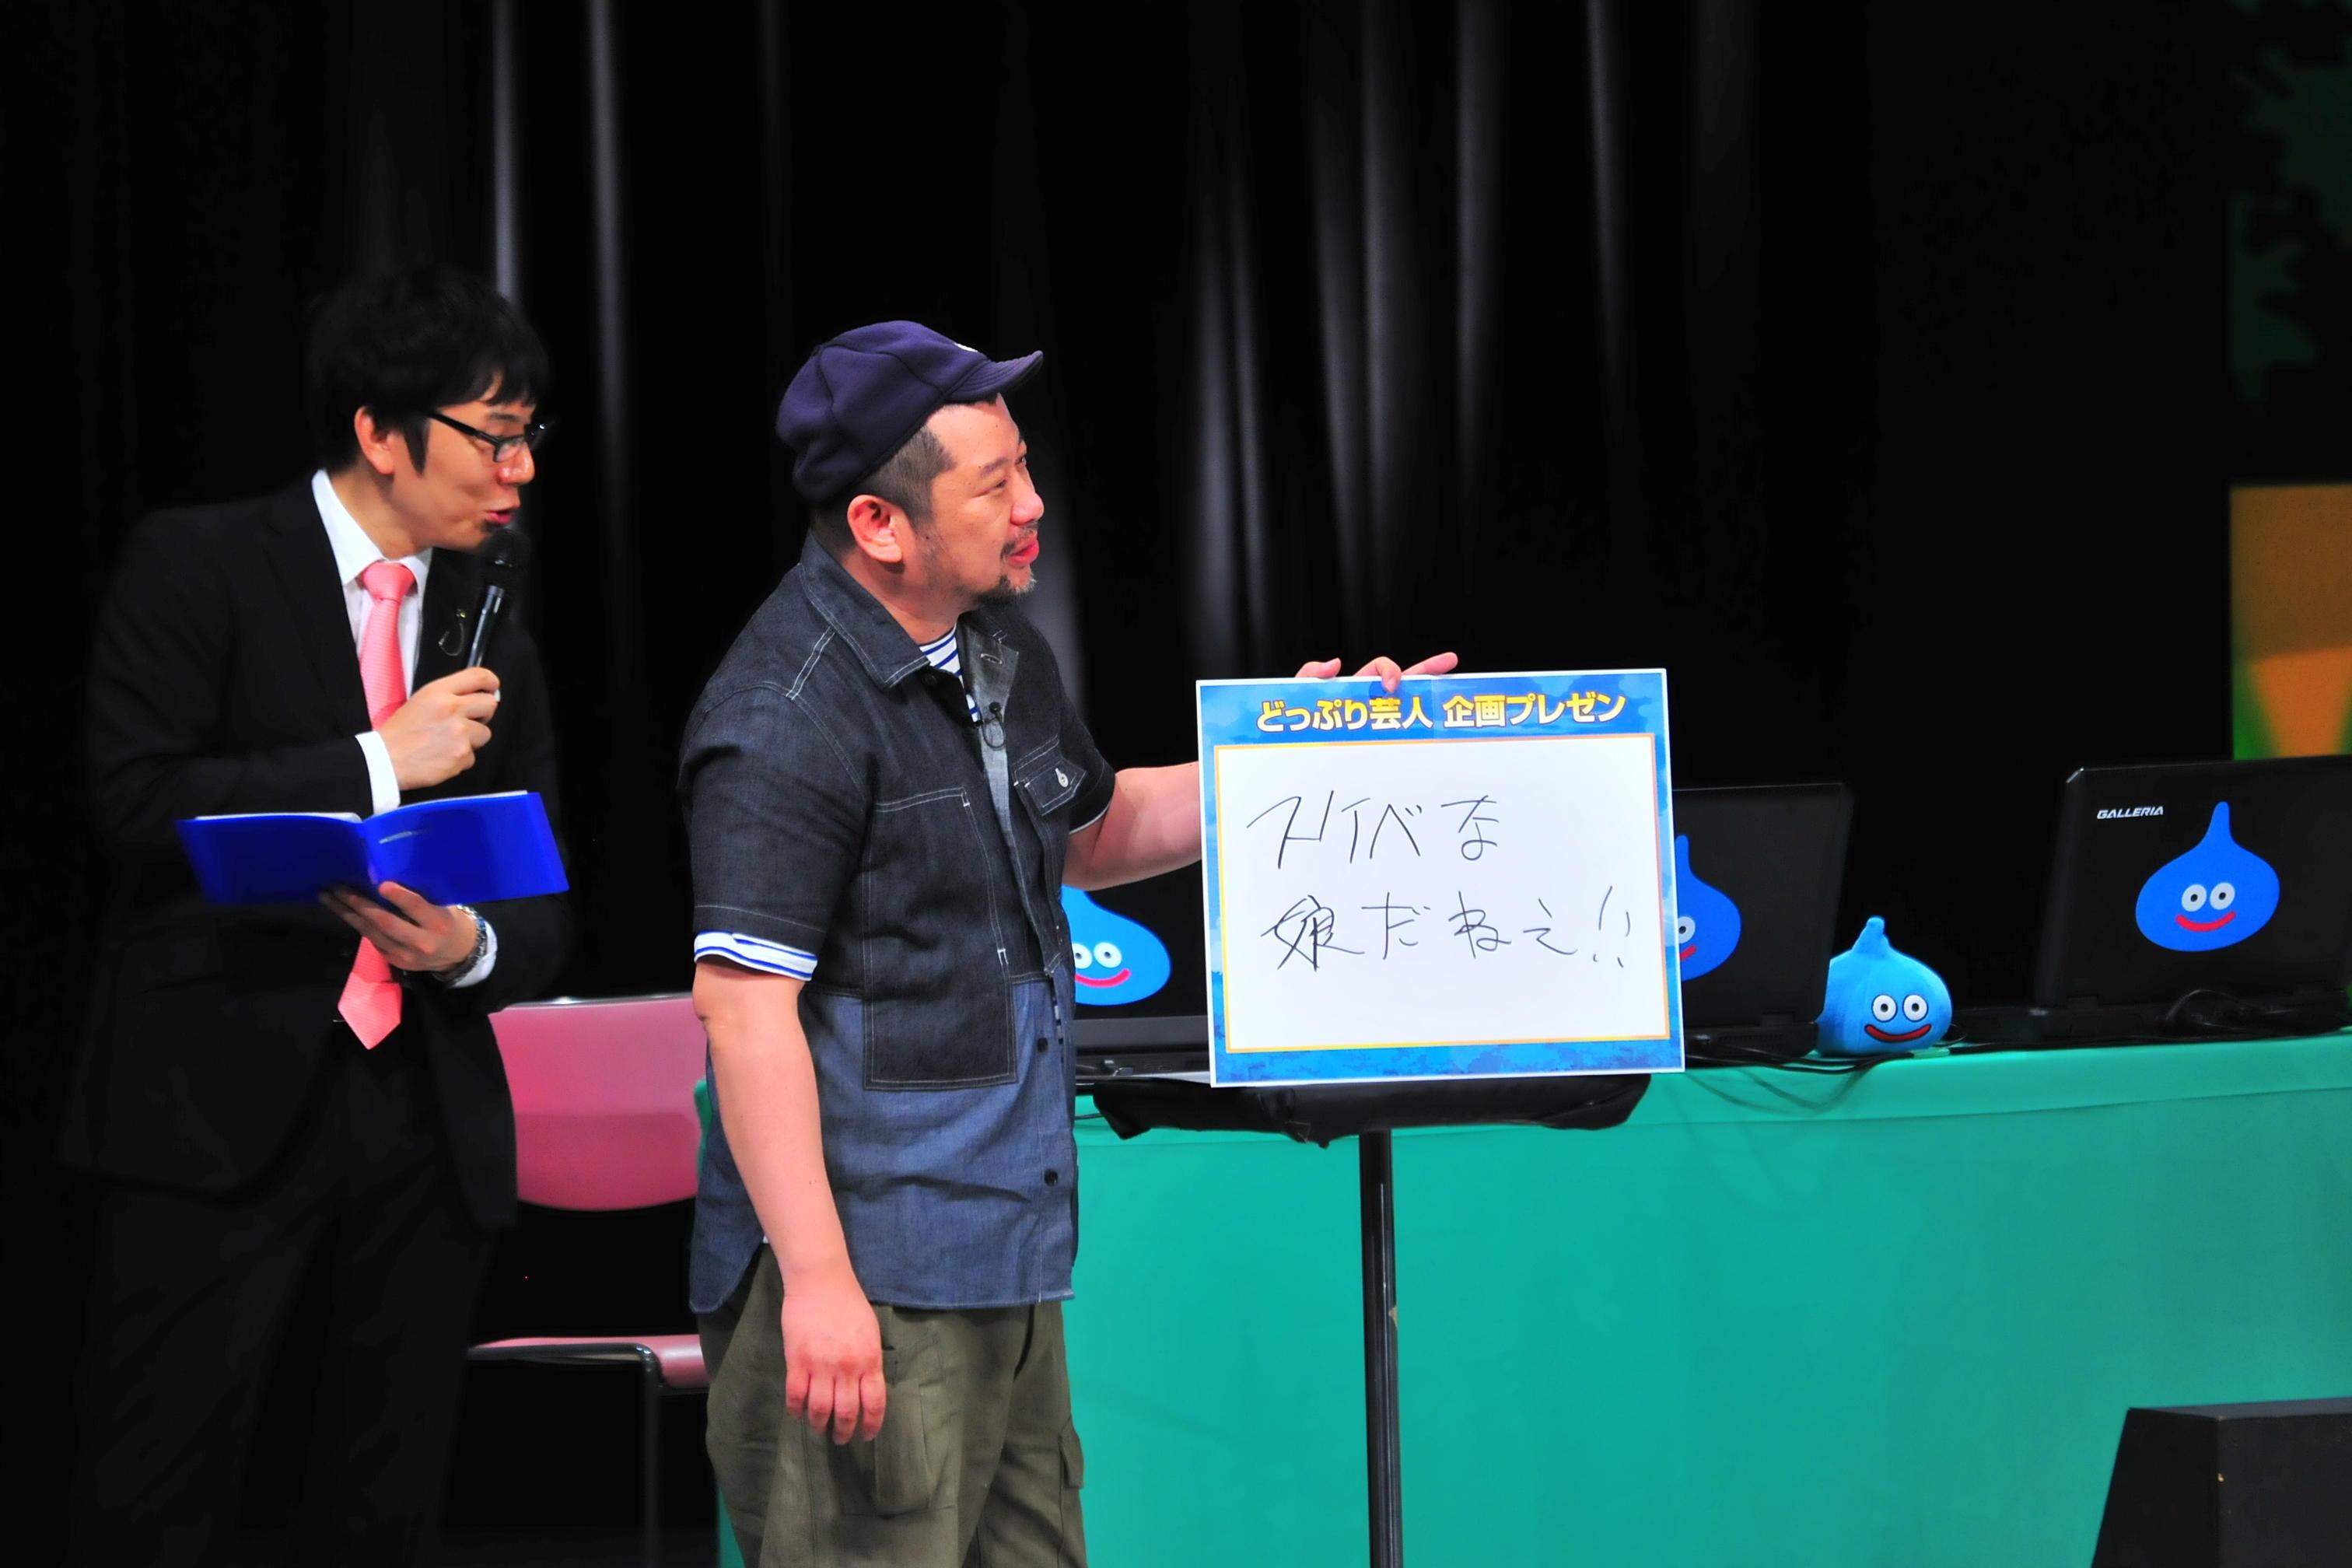 http://news.yoshimoto.co.jp/20160613095316-464632857ae90703384b264bc49ab3c8a4a0ab11.jpg